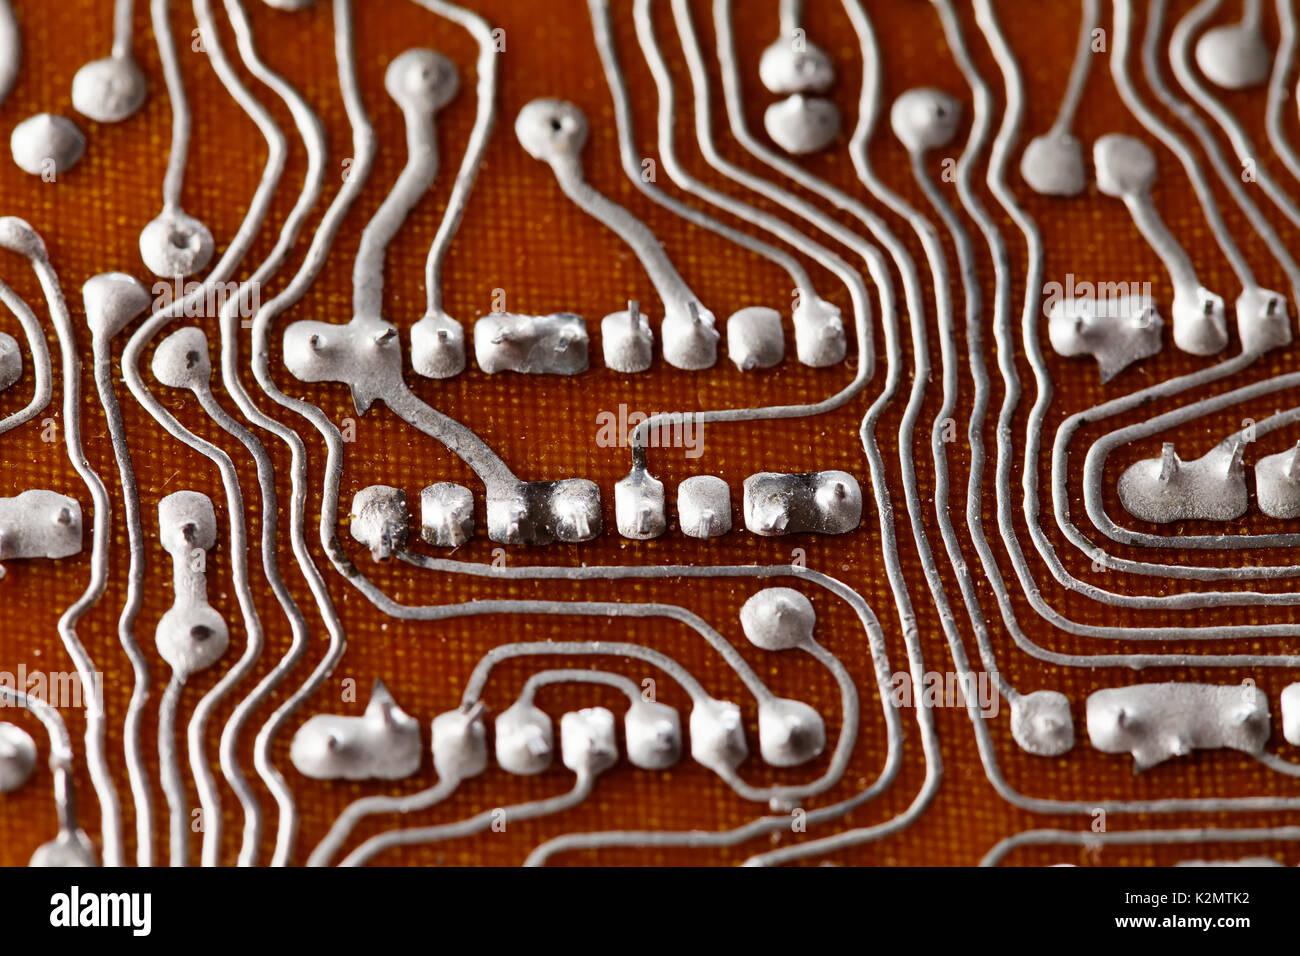 Electric Circuit Motherboard Stockfotos & Electric Circuit ...